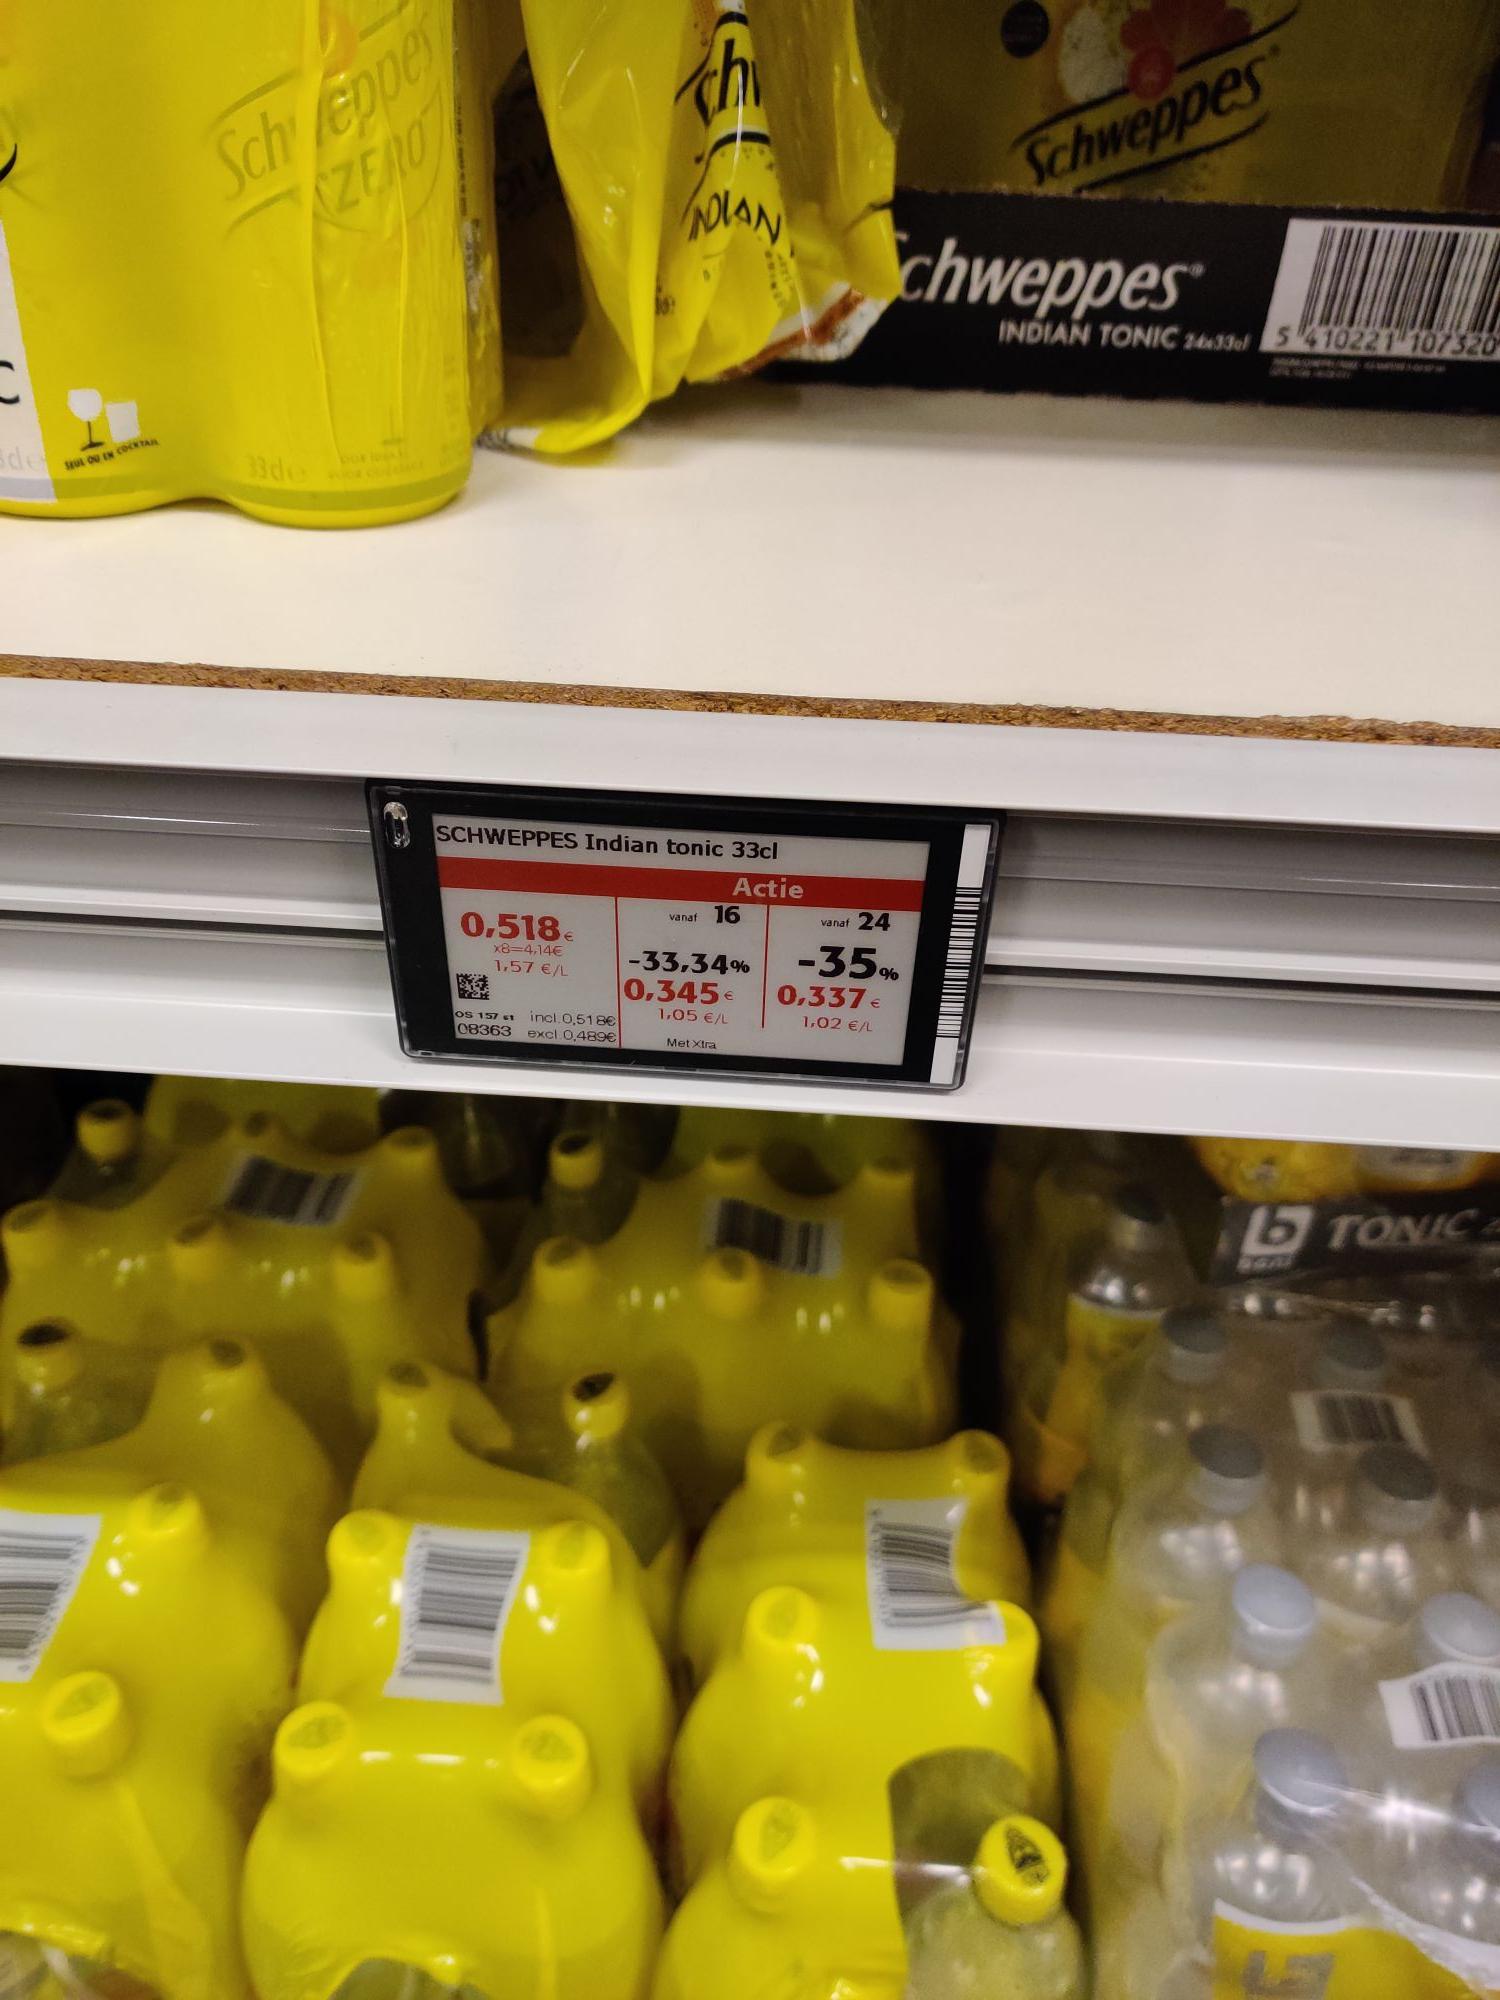 [GRENSDEAL BELGIË] Schweppes indian tonic 33cl blikjes, €0,34 per stuk vanaf 24